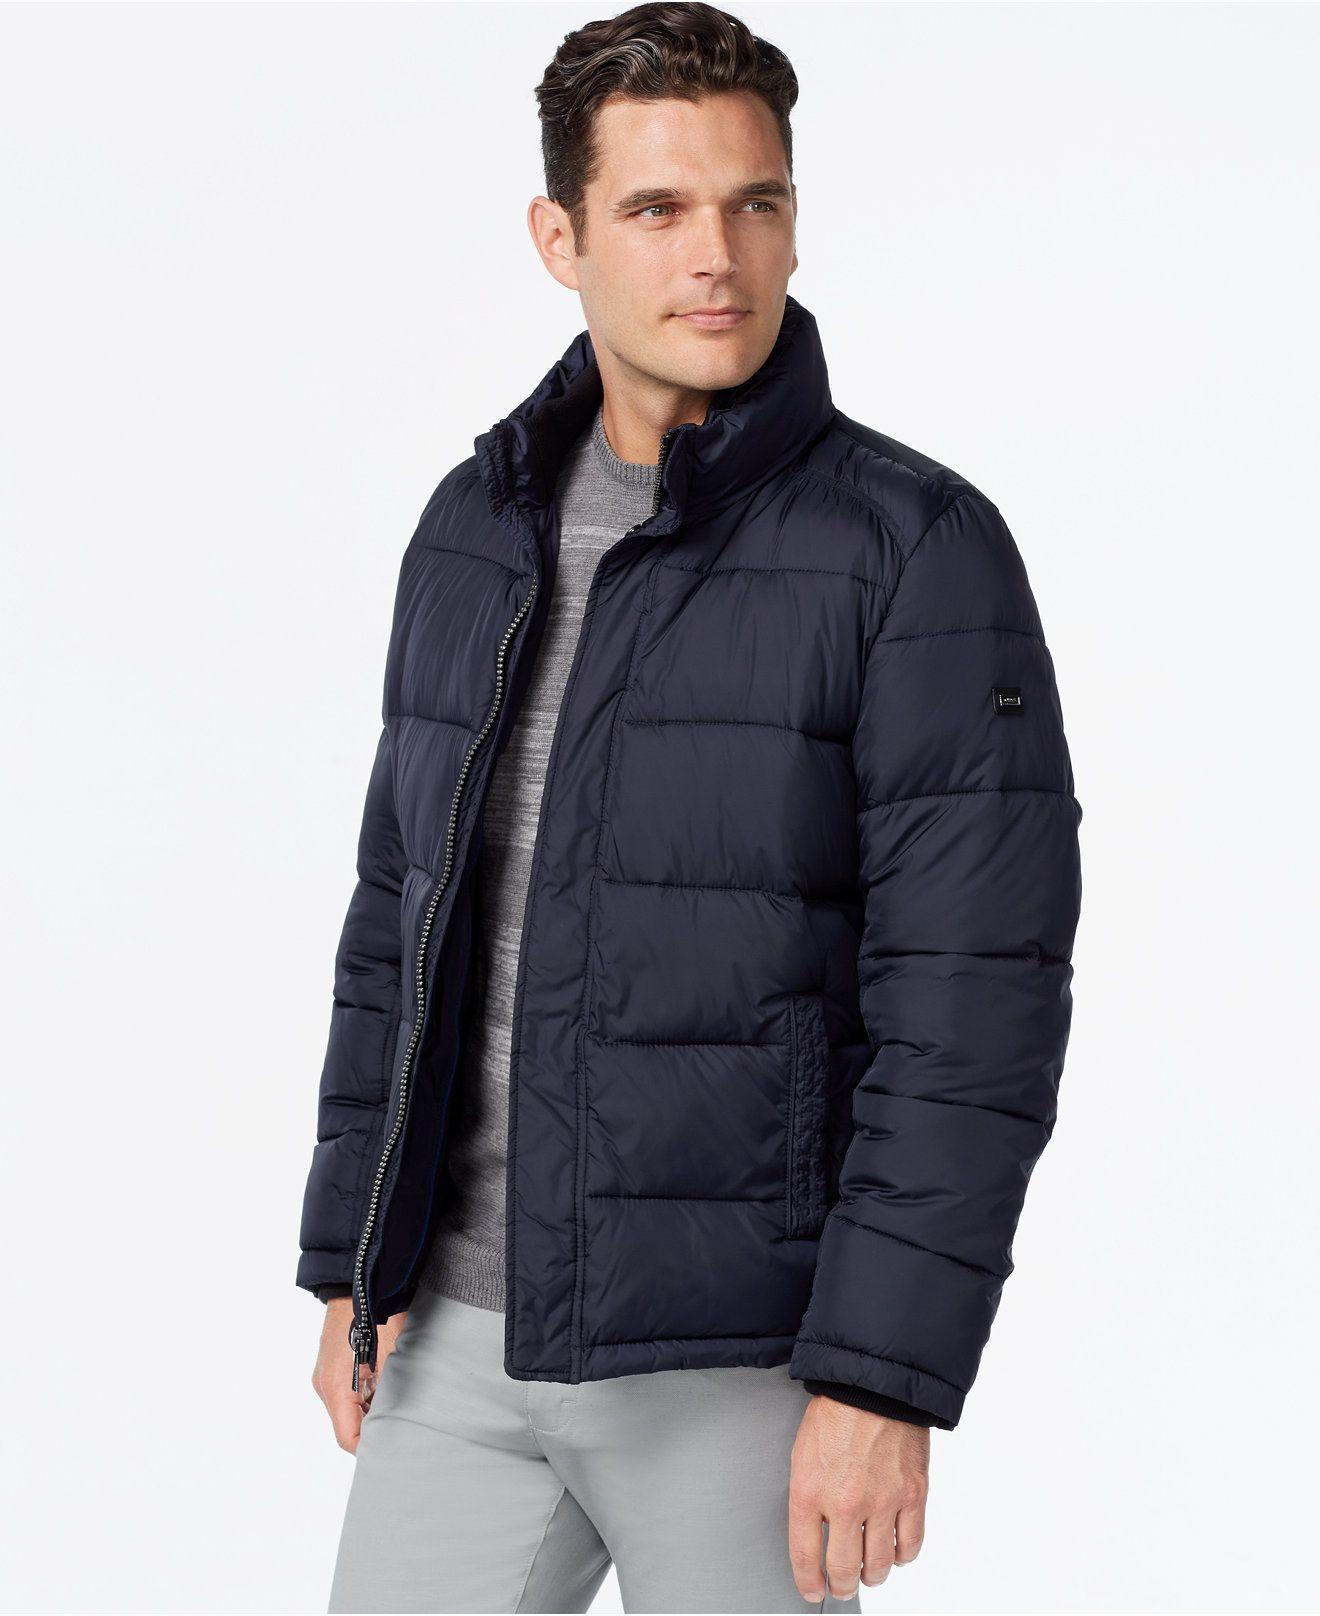 Calvin Klein Men S Jacket Coats Jackets Men Macy S Calvin Klein Men Mens Puffer Coat Mens Jackets [ 1616 x 1320 Pixel ]